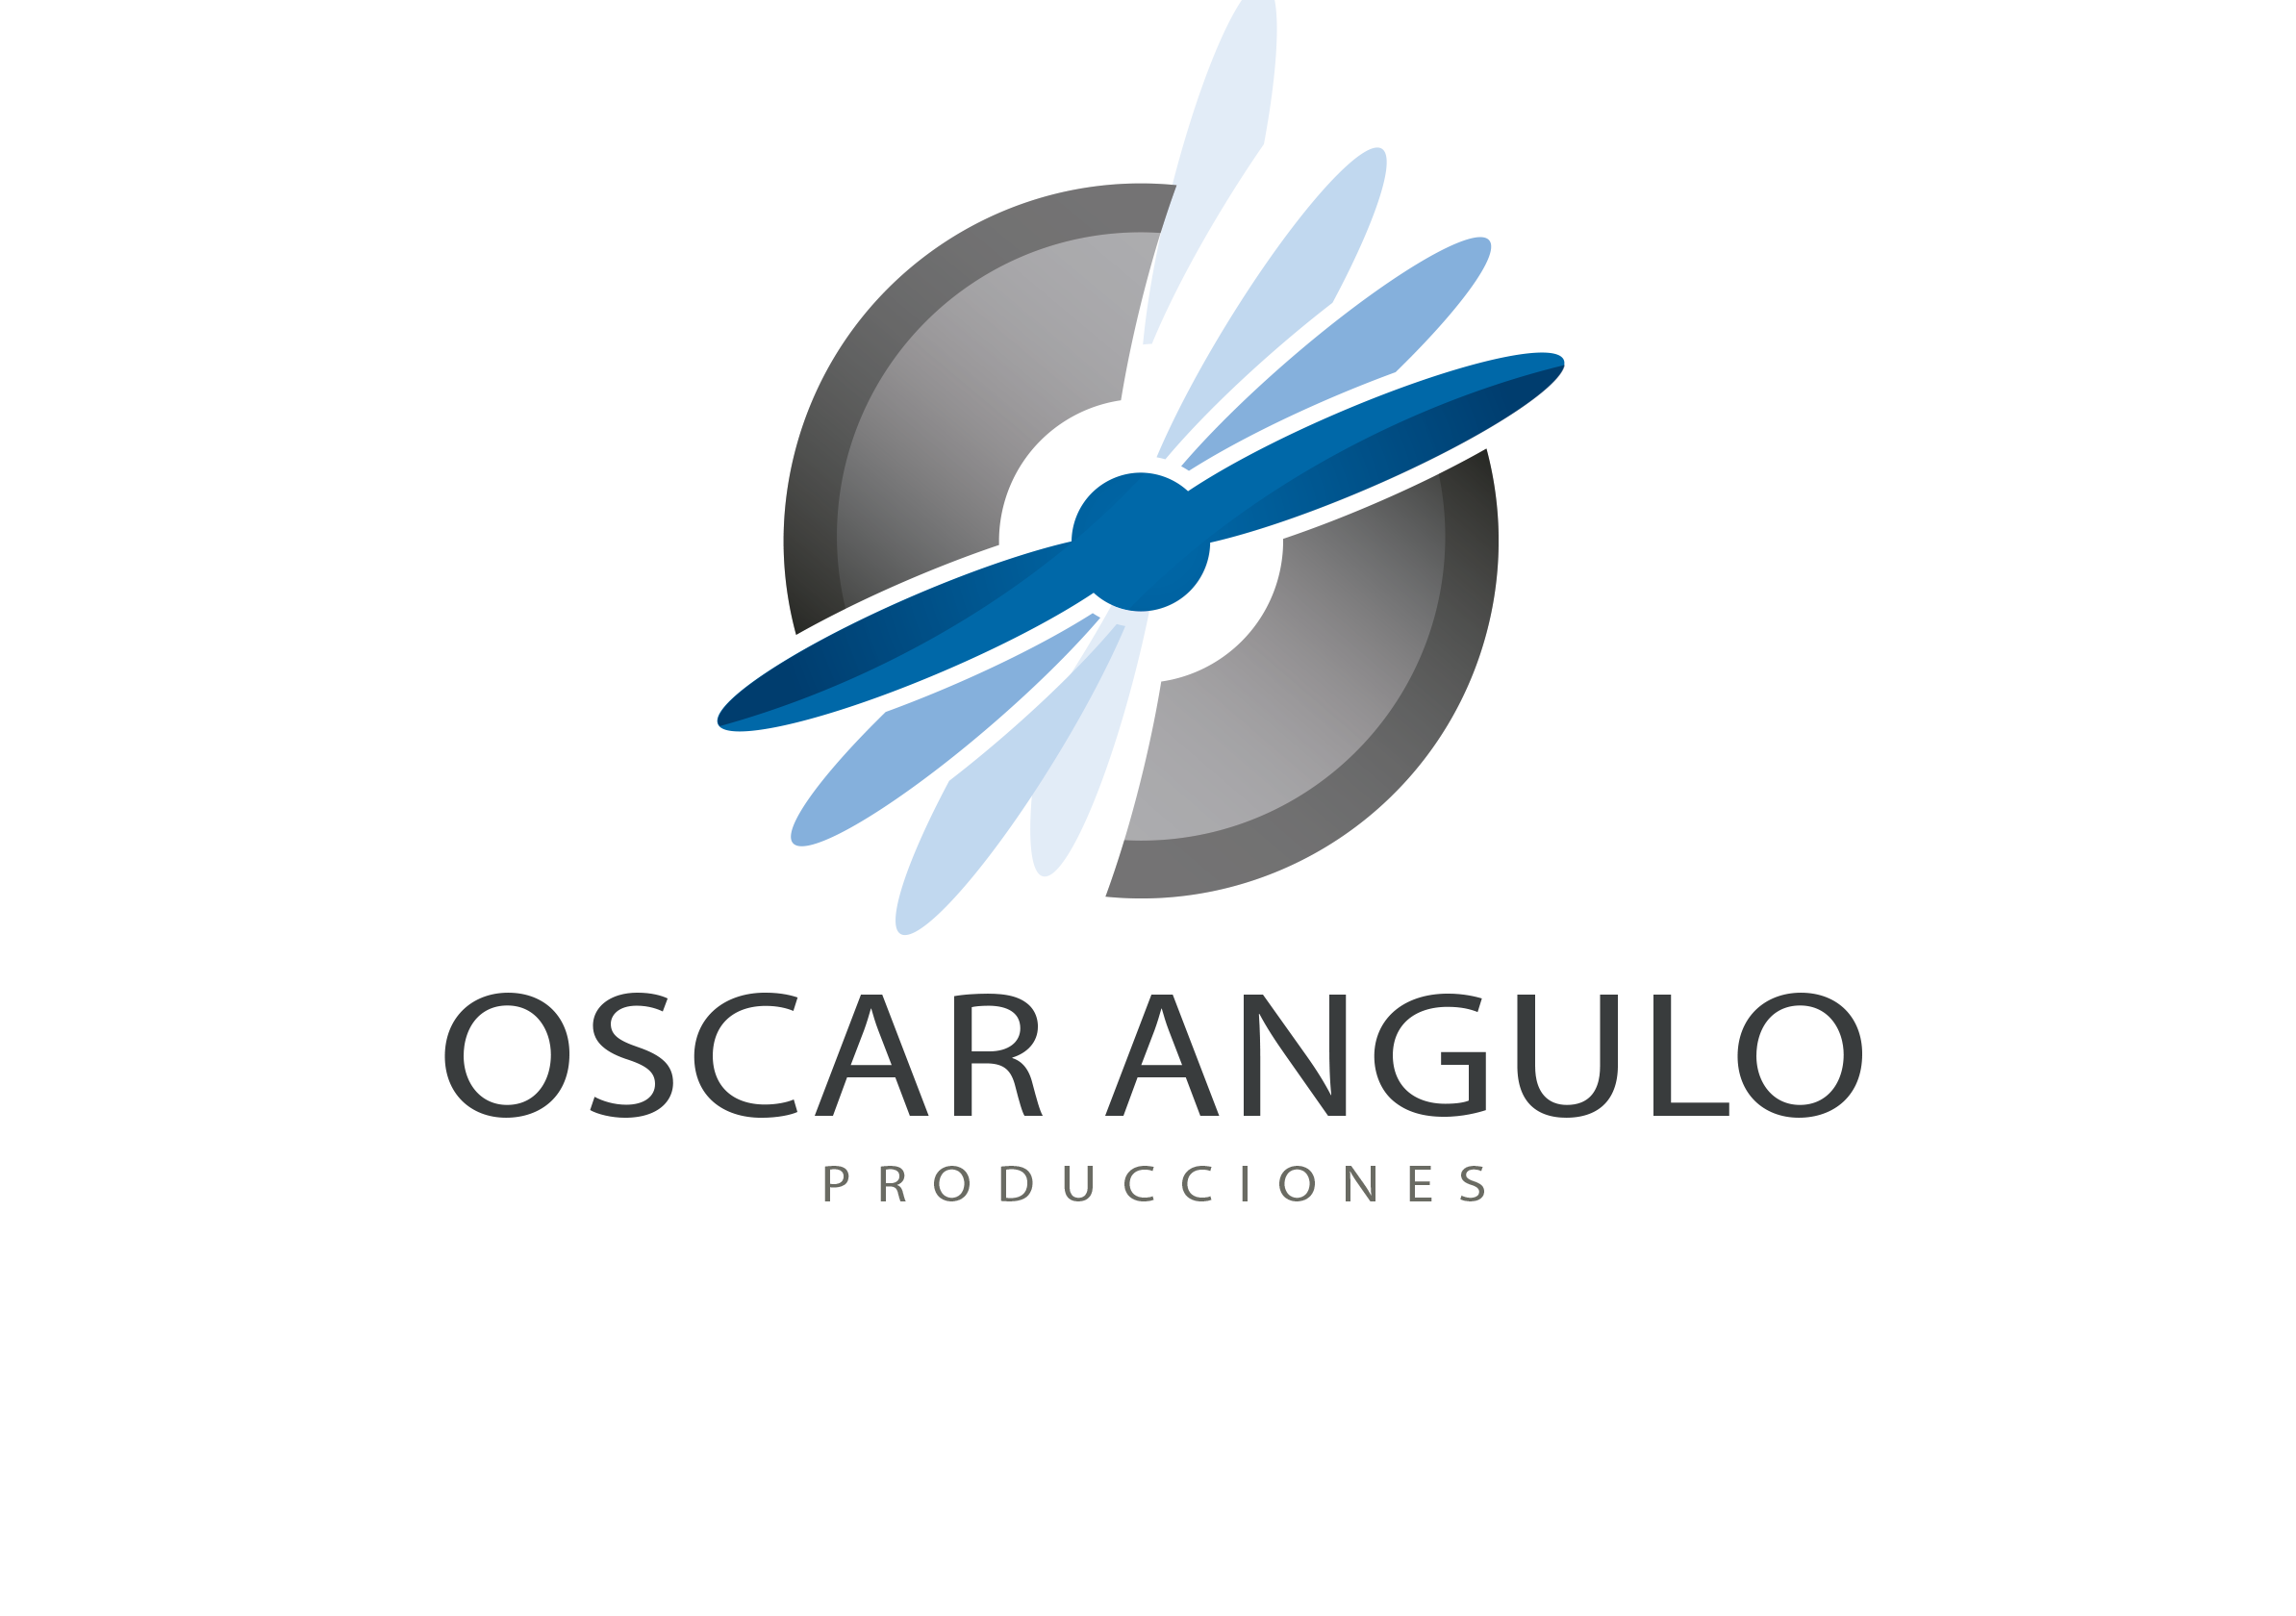 Oscar Angulo